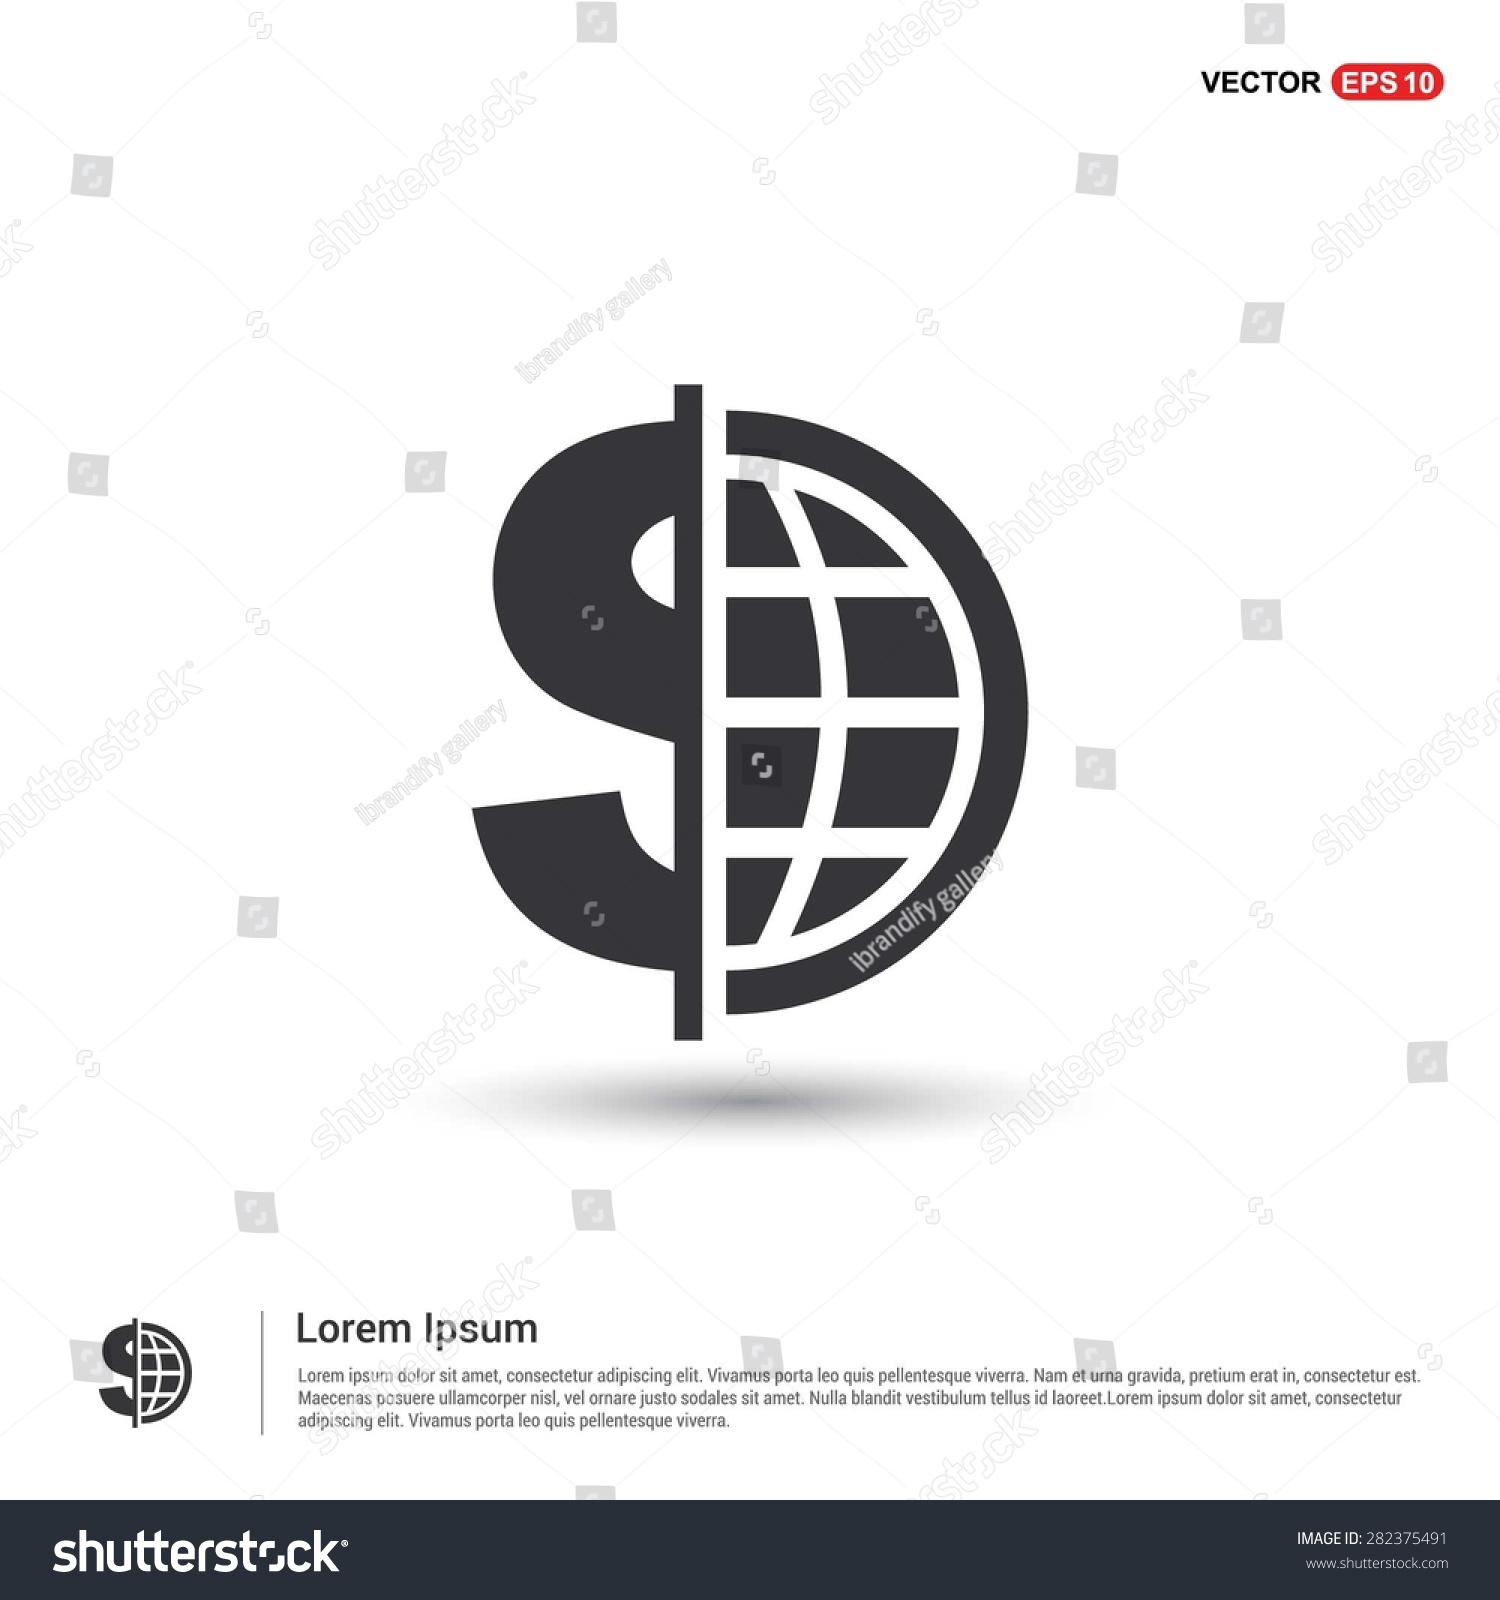 Dollar currency symbol world globe icon stock vector 282375491 dollar currency symbol with world globe icon abstract logo type icon isometric white background biocorpaavc Choice Image